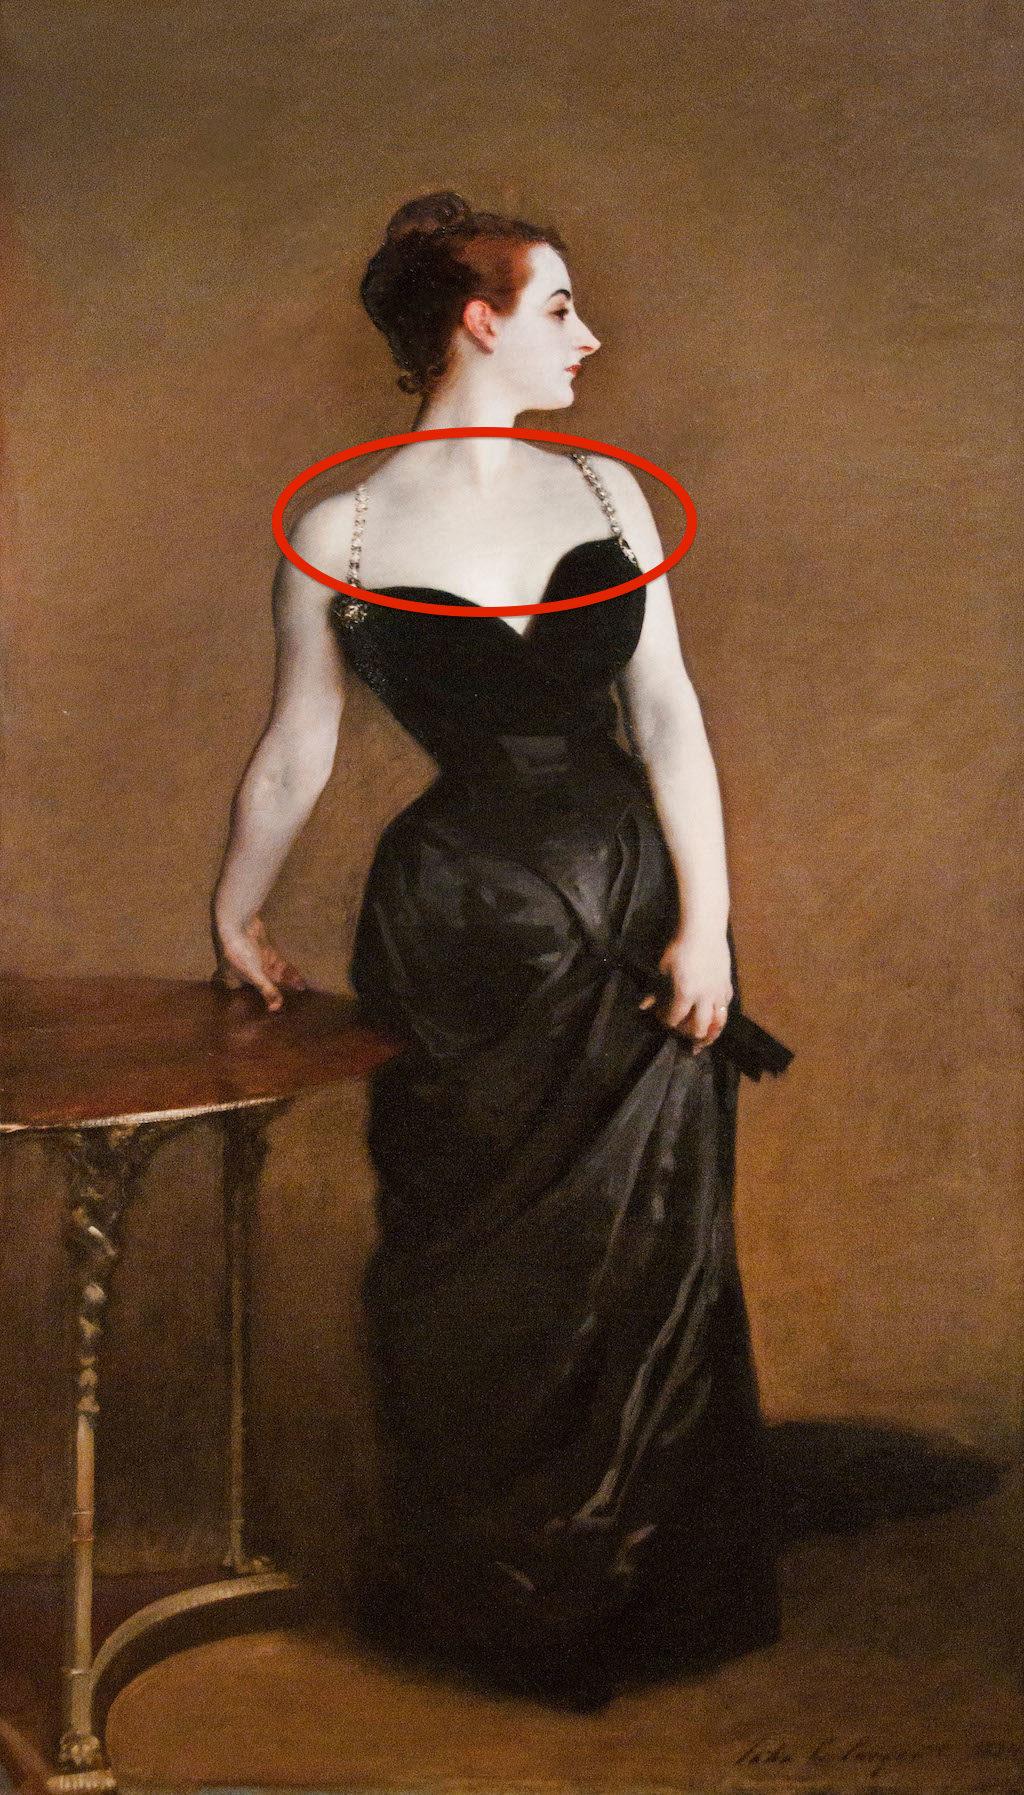 CTP67X Madame X Madame Pierre Gautreau 1883 John Singer Sargent American United States of America